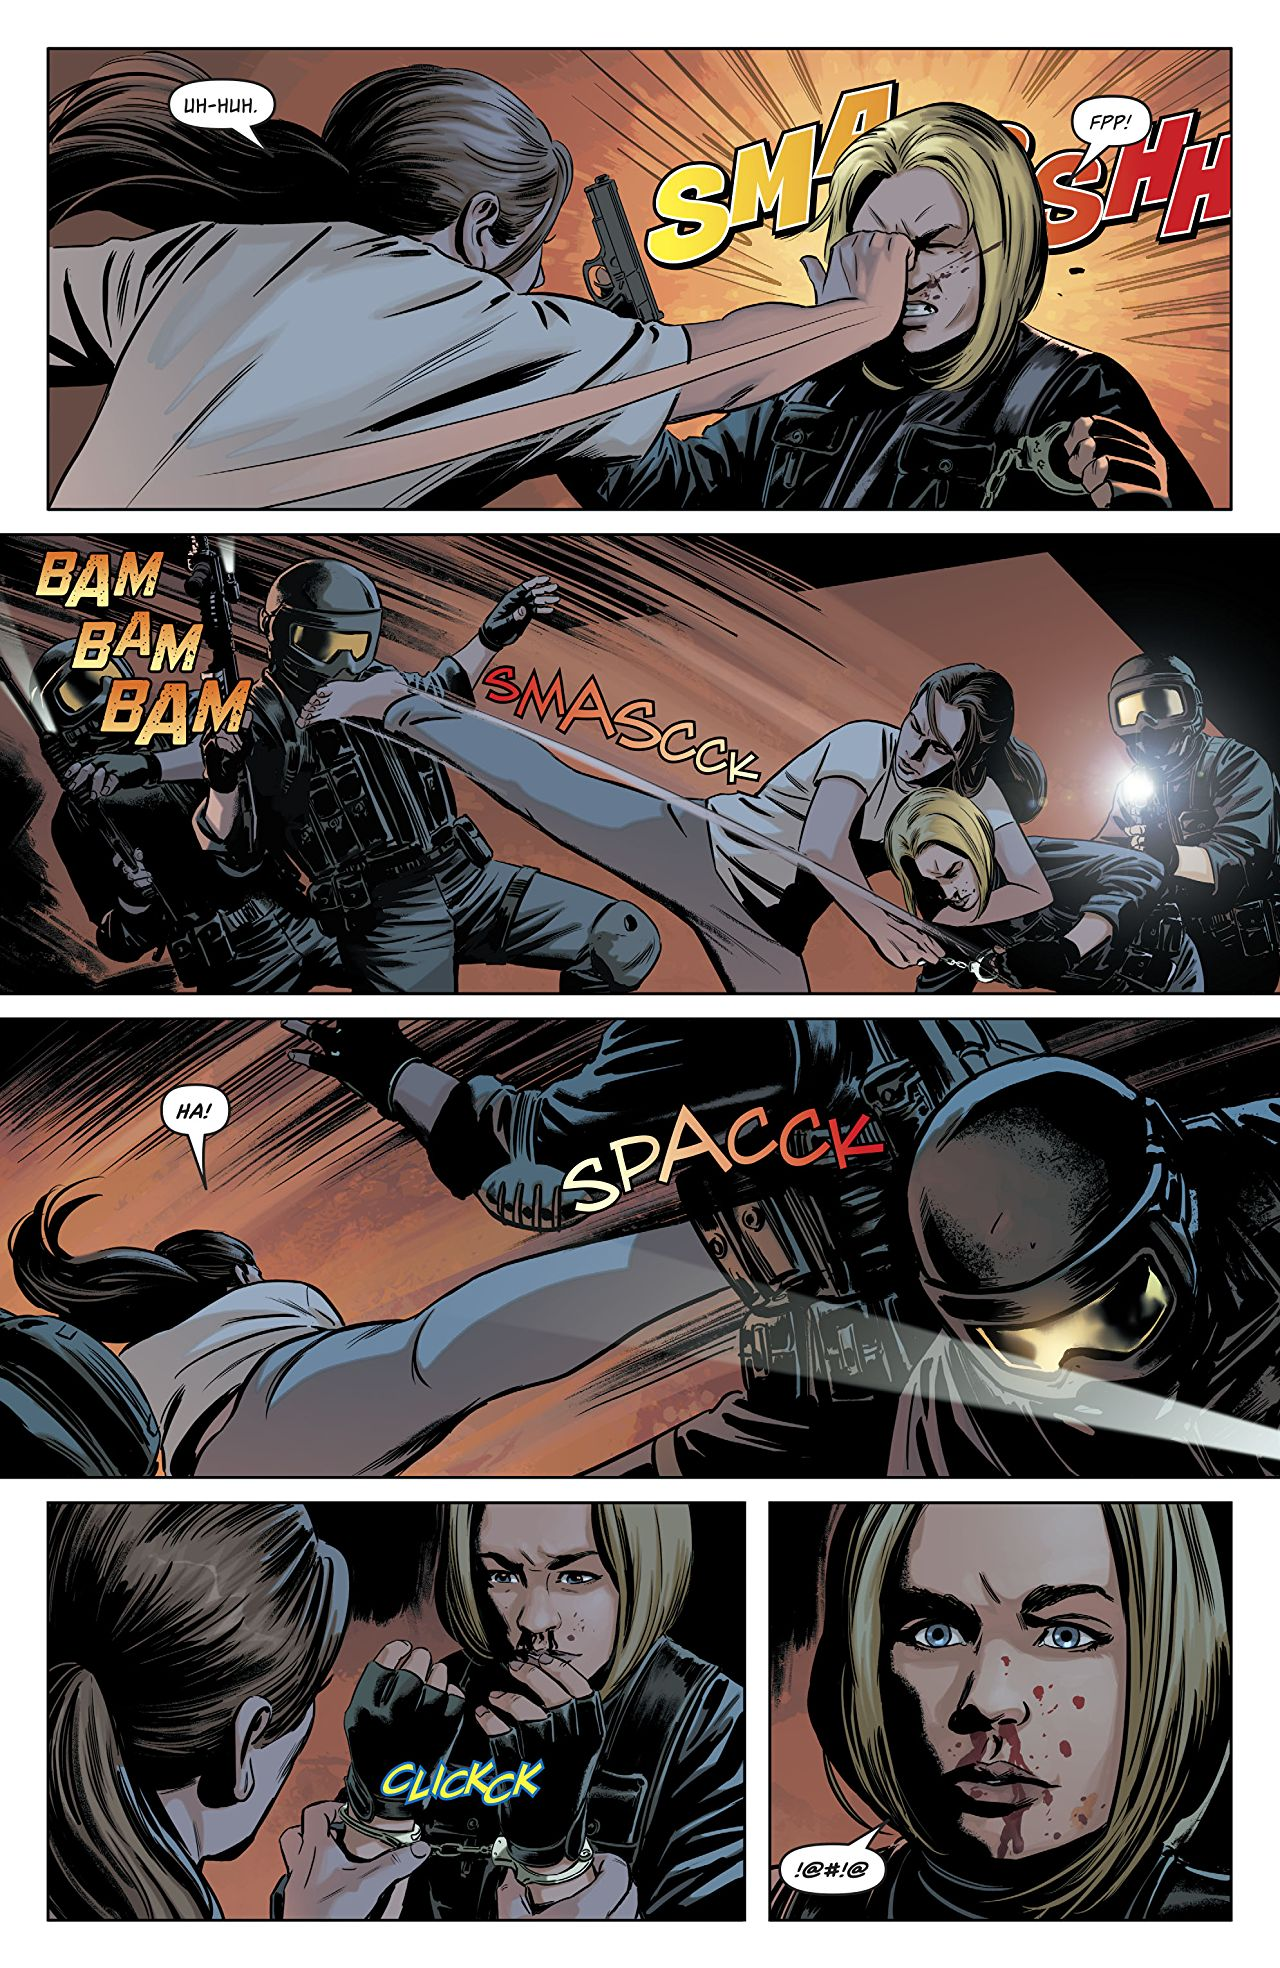 Action Comics 1011 3.jpg